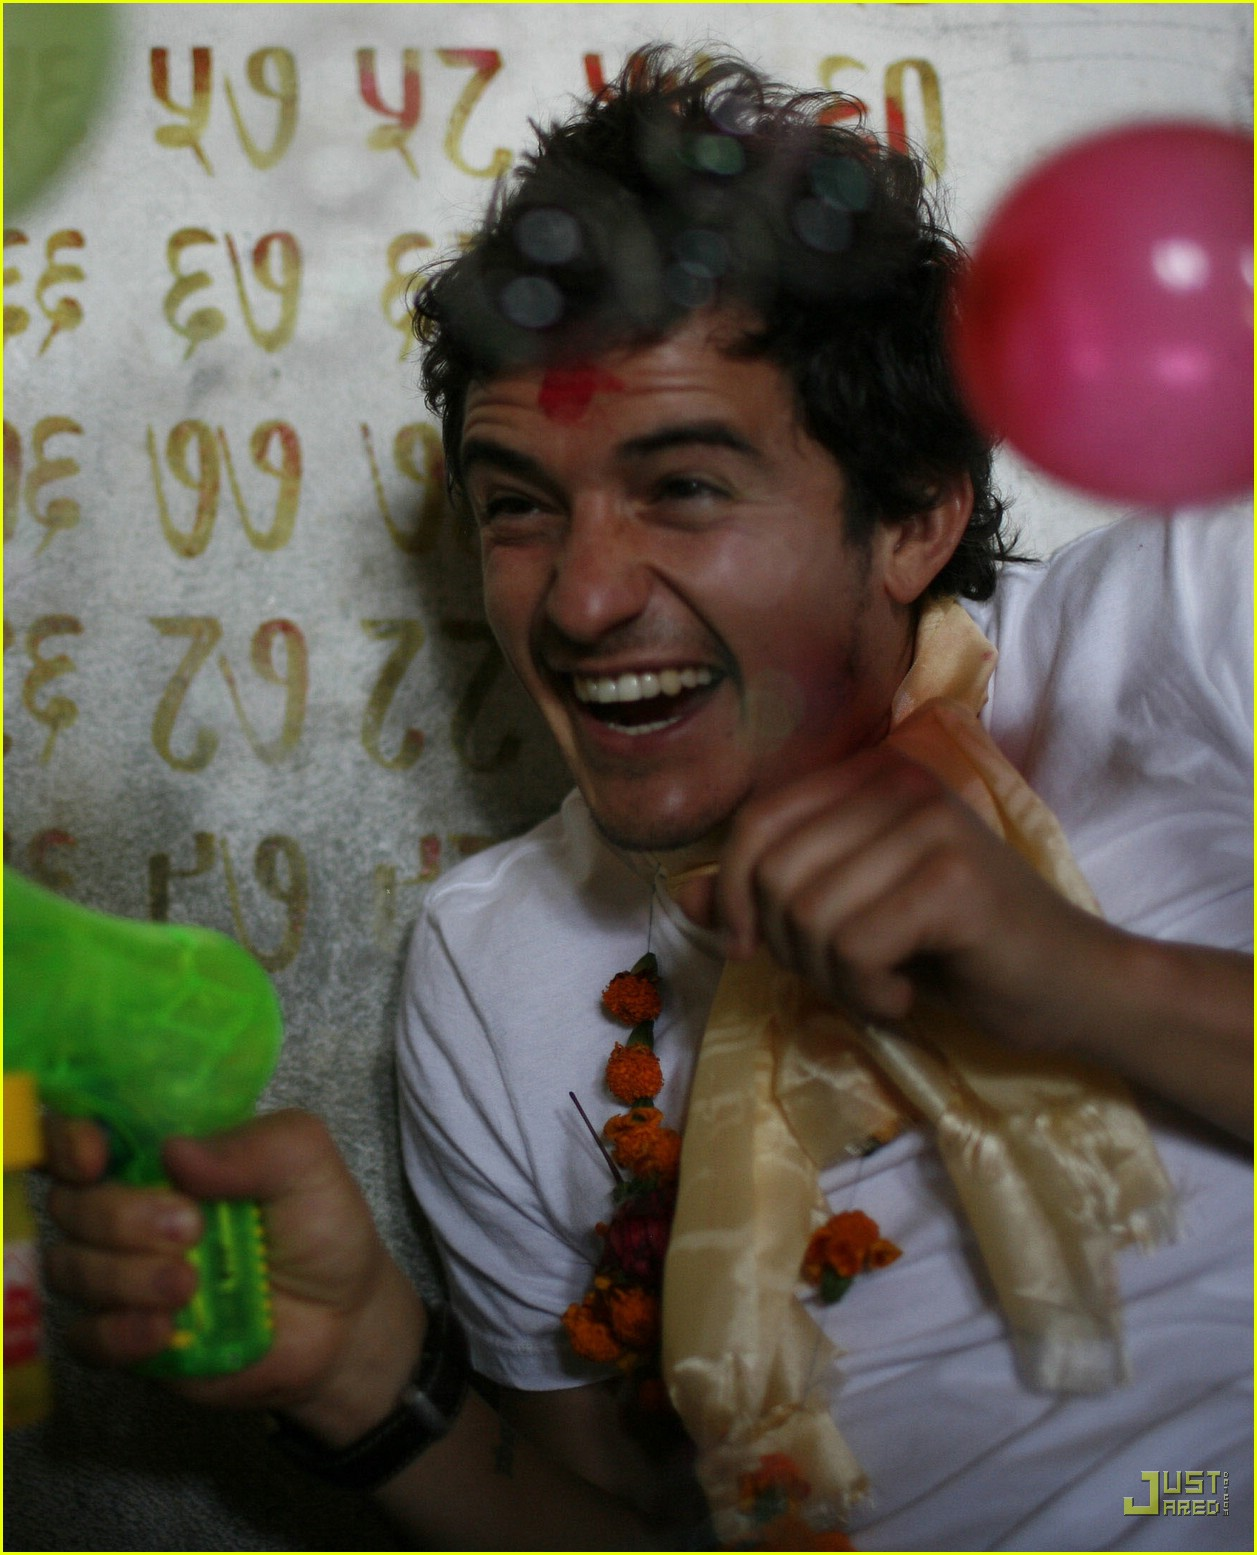 http://1.bp.blogspot.com/_HNrxJUJz8TQ/TS9JNW3y7RI/AAAAAAAABi8/d8klveA0kHU/s1600/orlando-bloom-nepal-03.jpg